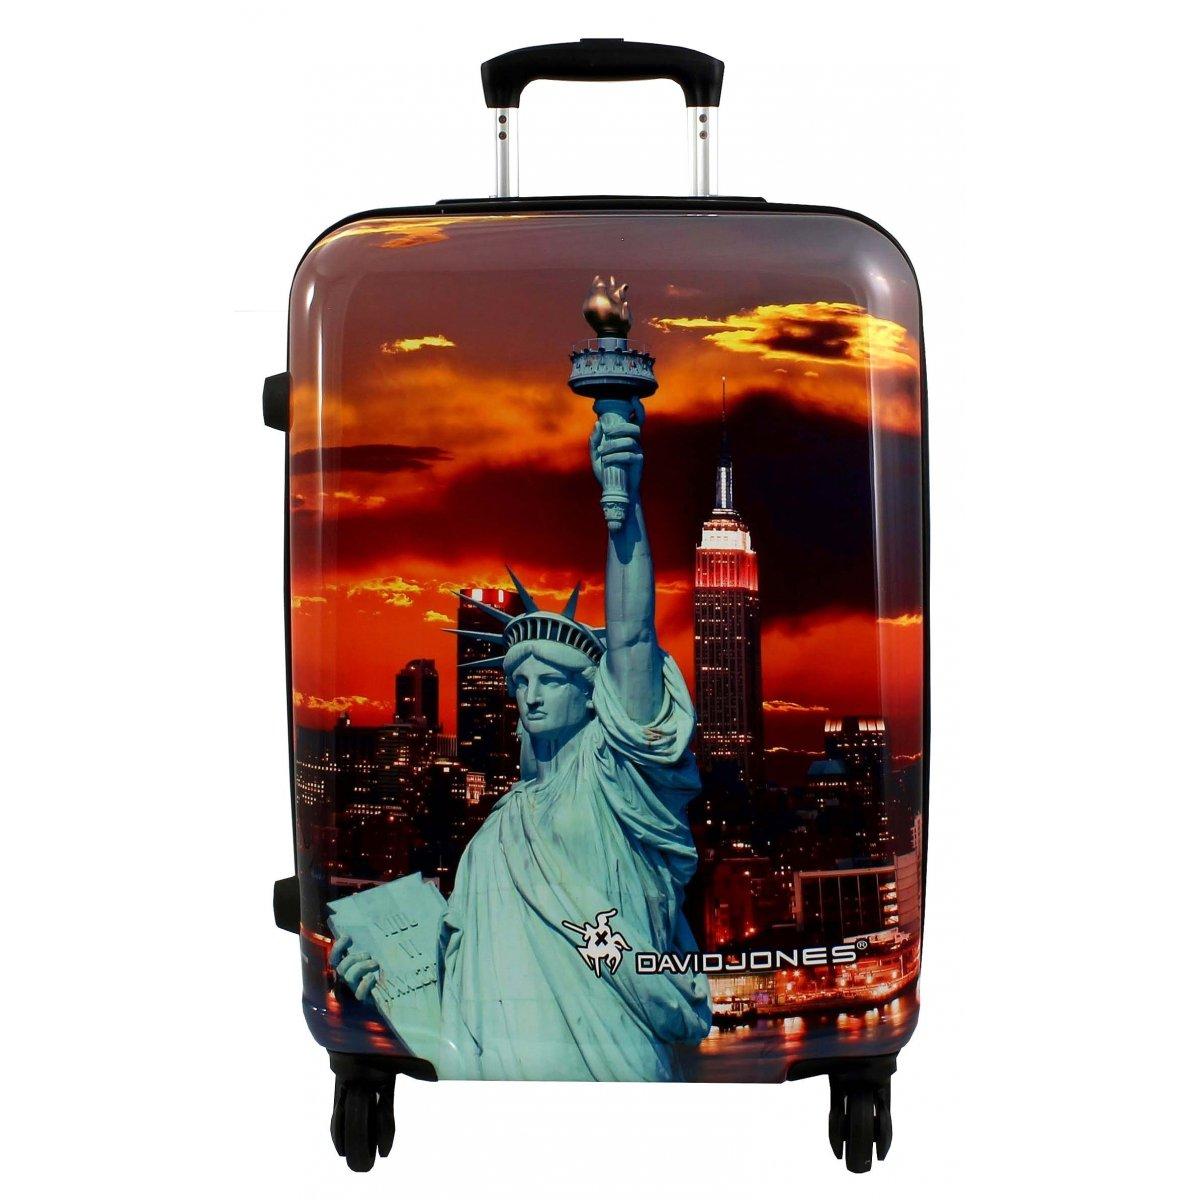 lot 3 valises dont 1 cabine ryanair david jones poly couleur principale statue liberte. Black Bedroom Furniture Sets. Home Design Ideas